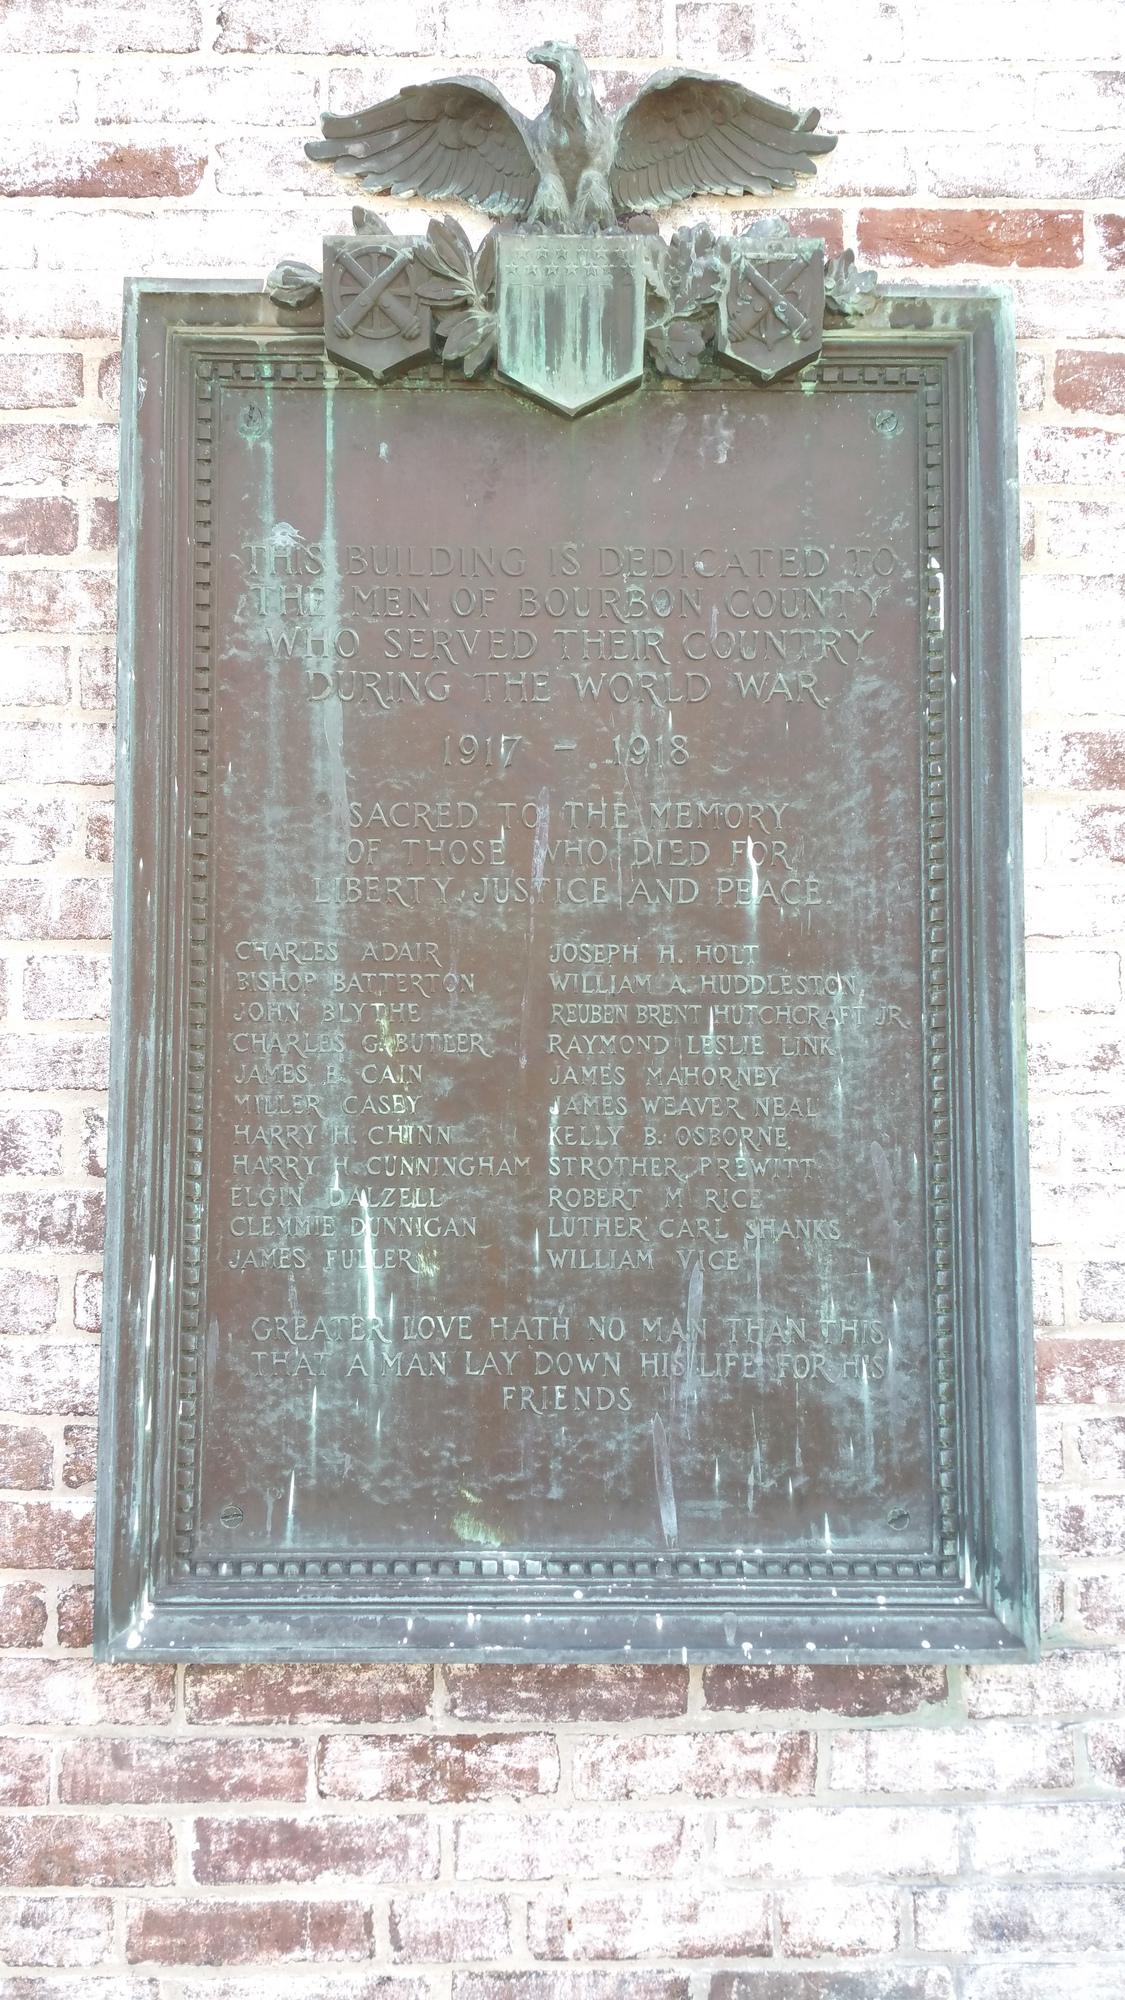 Bourbon County World War I Memorial Building (KY)